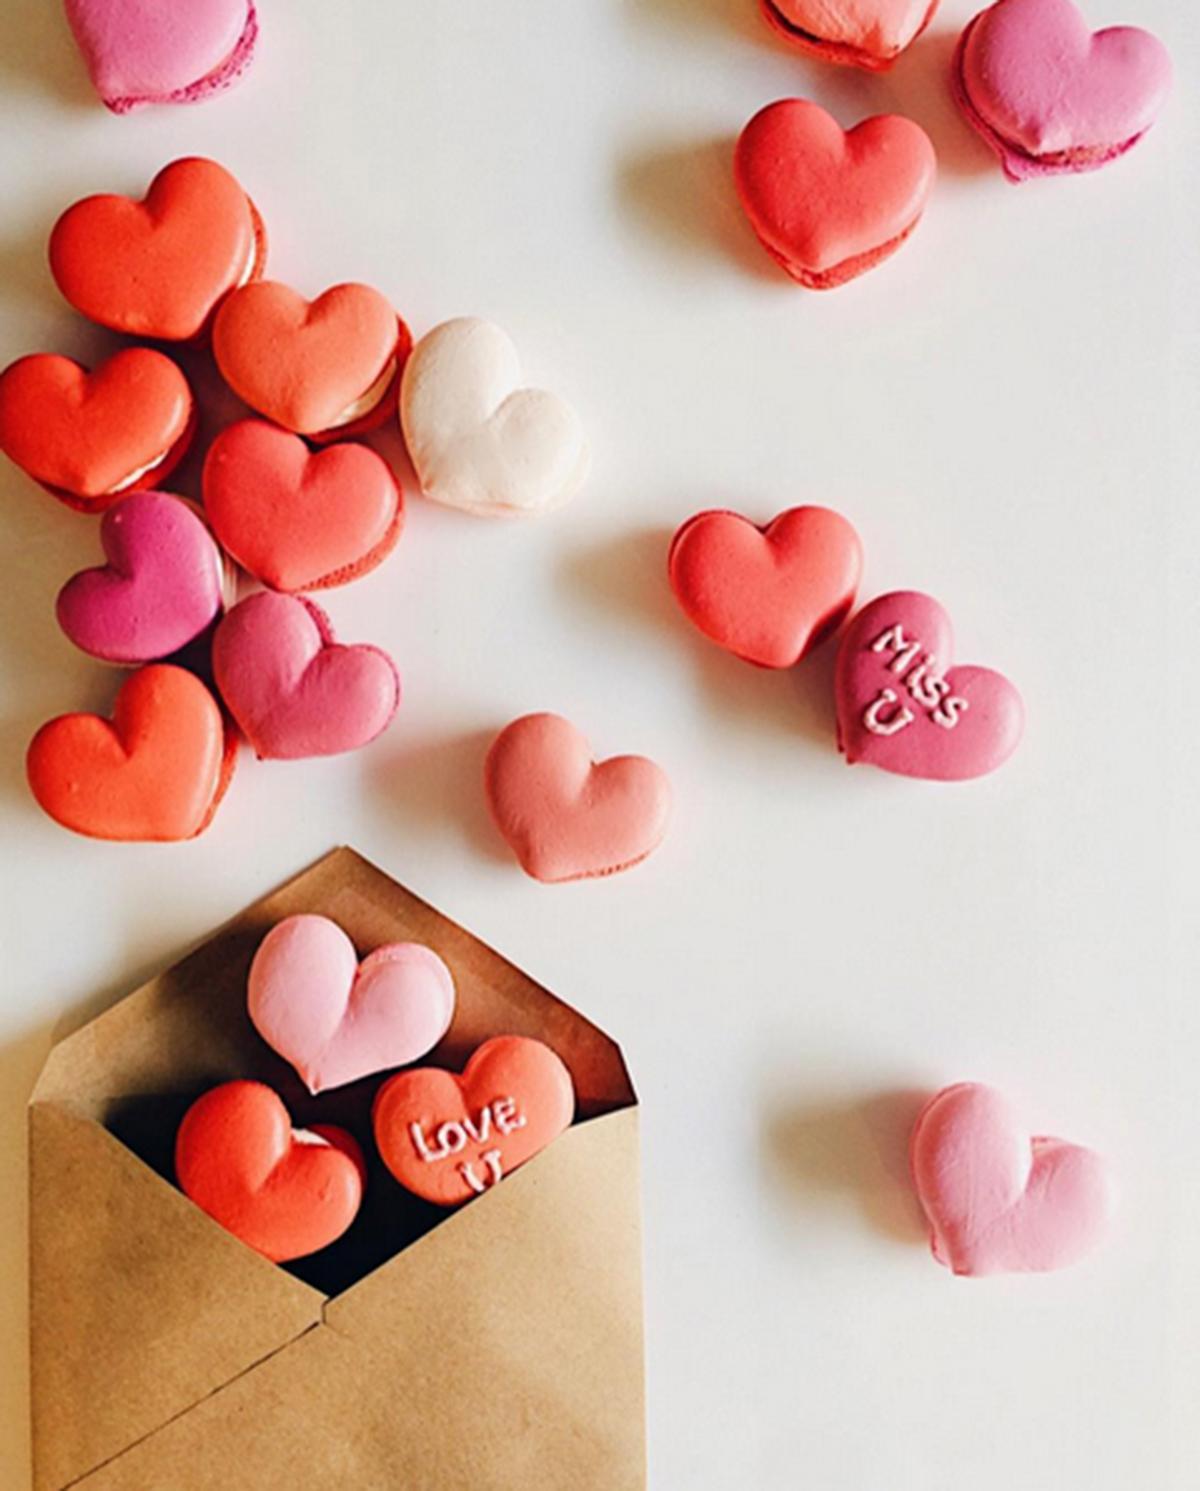 30 valentines day gift ideas